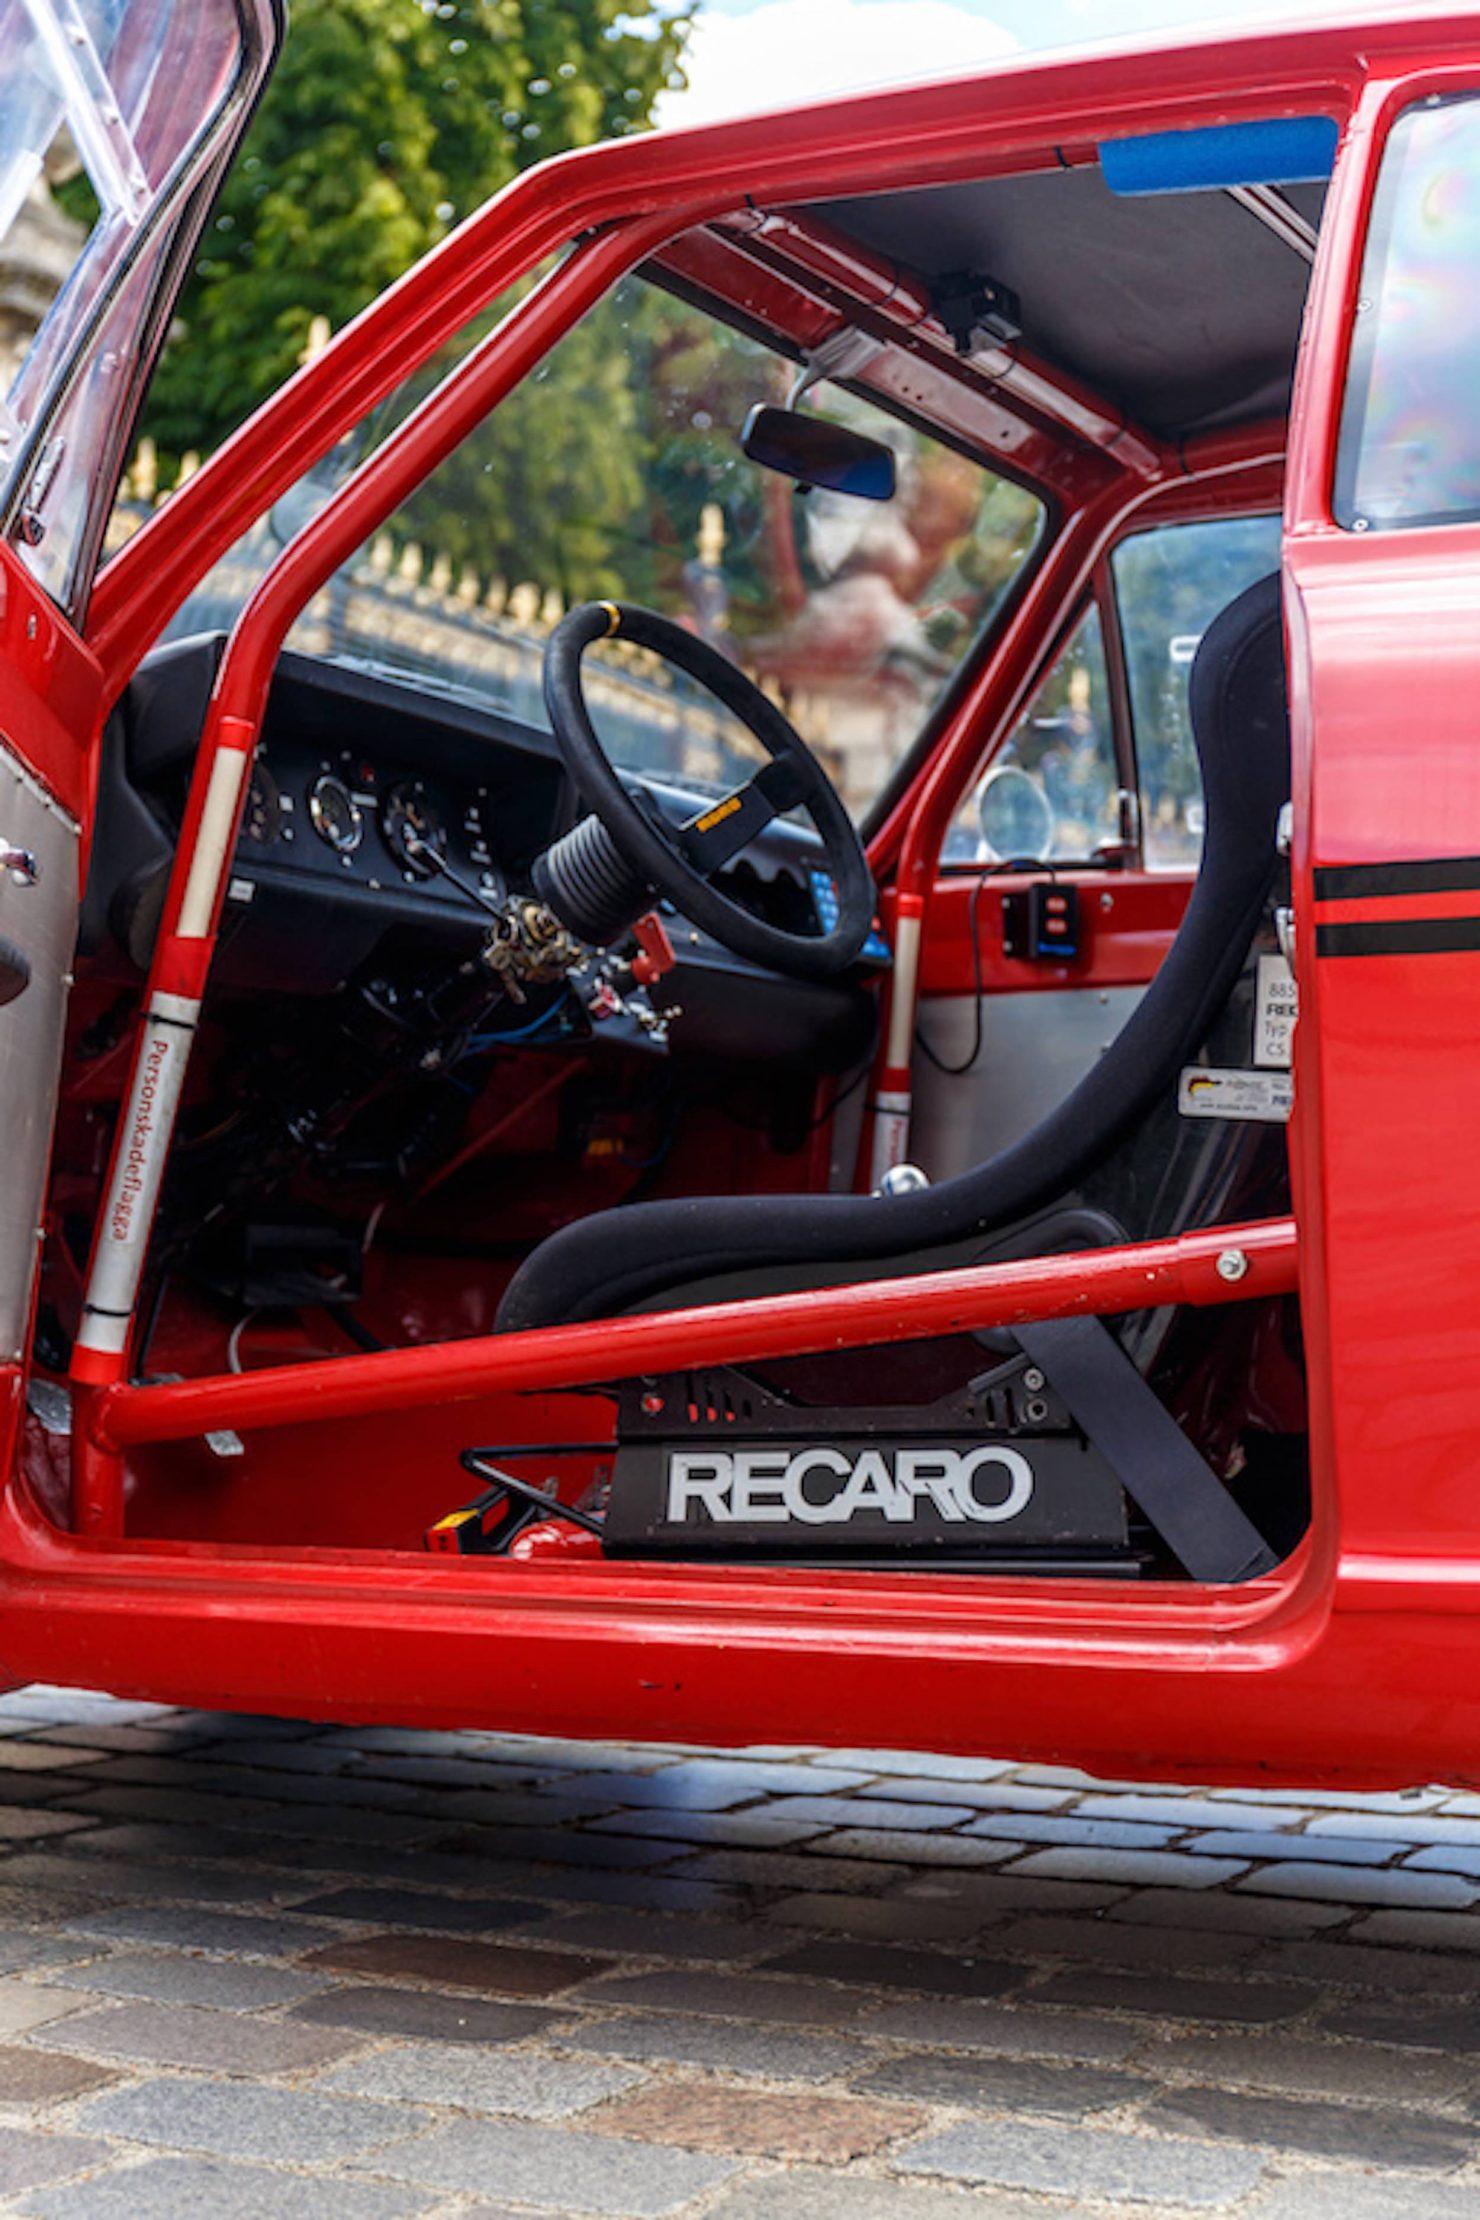 opel kadett rallye car 17 1480x2220 - 1969 Opel Rallye Kadett